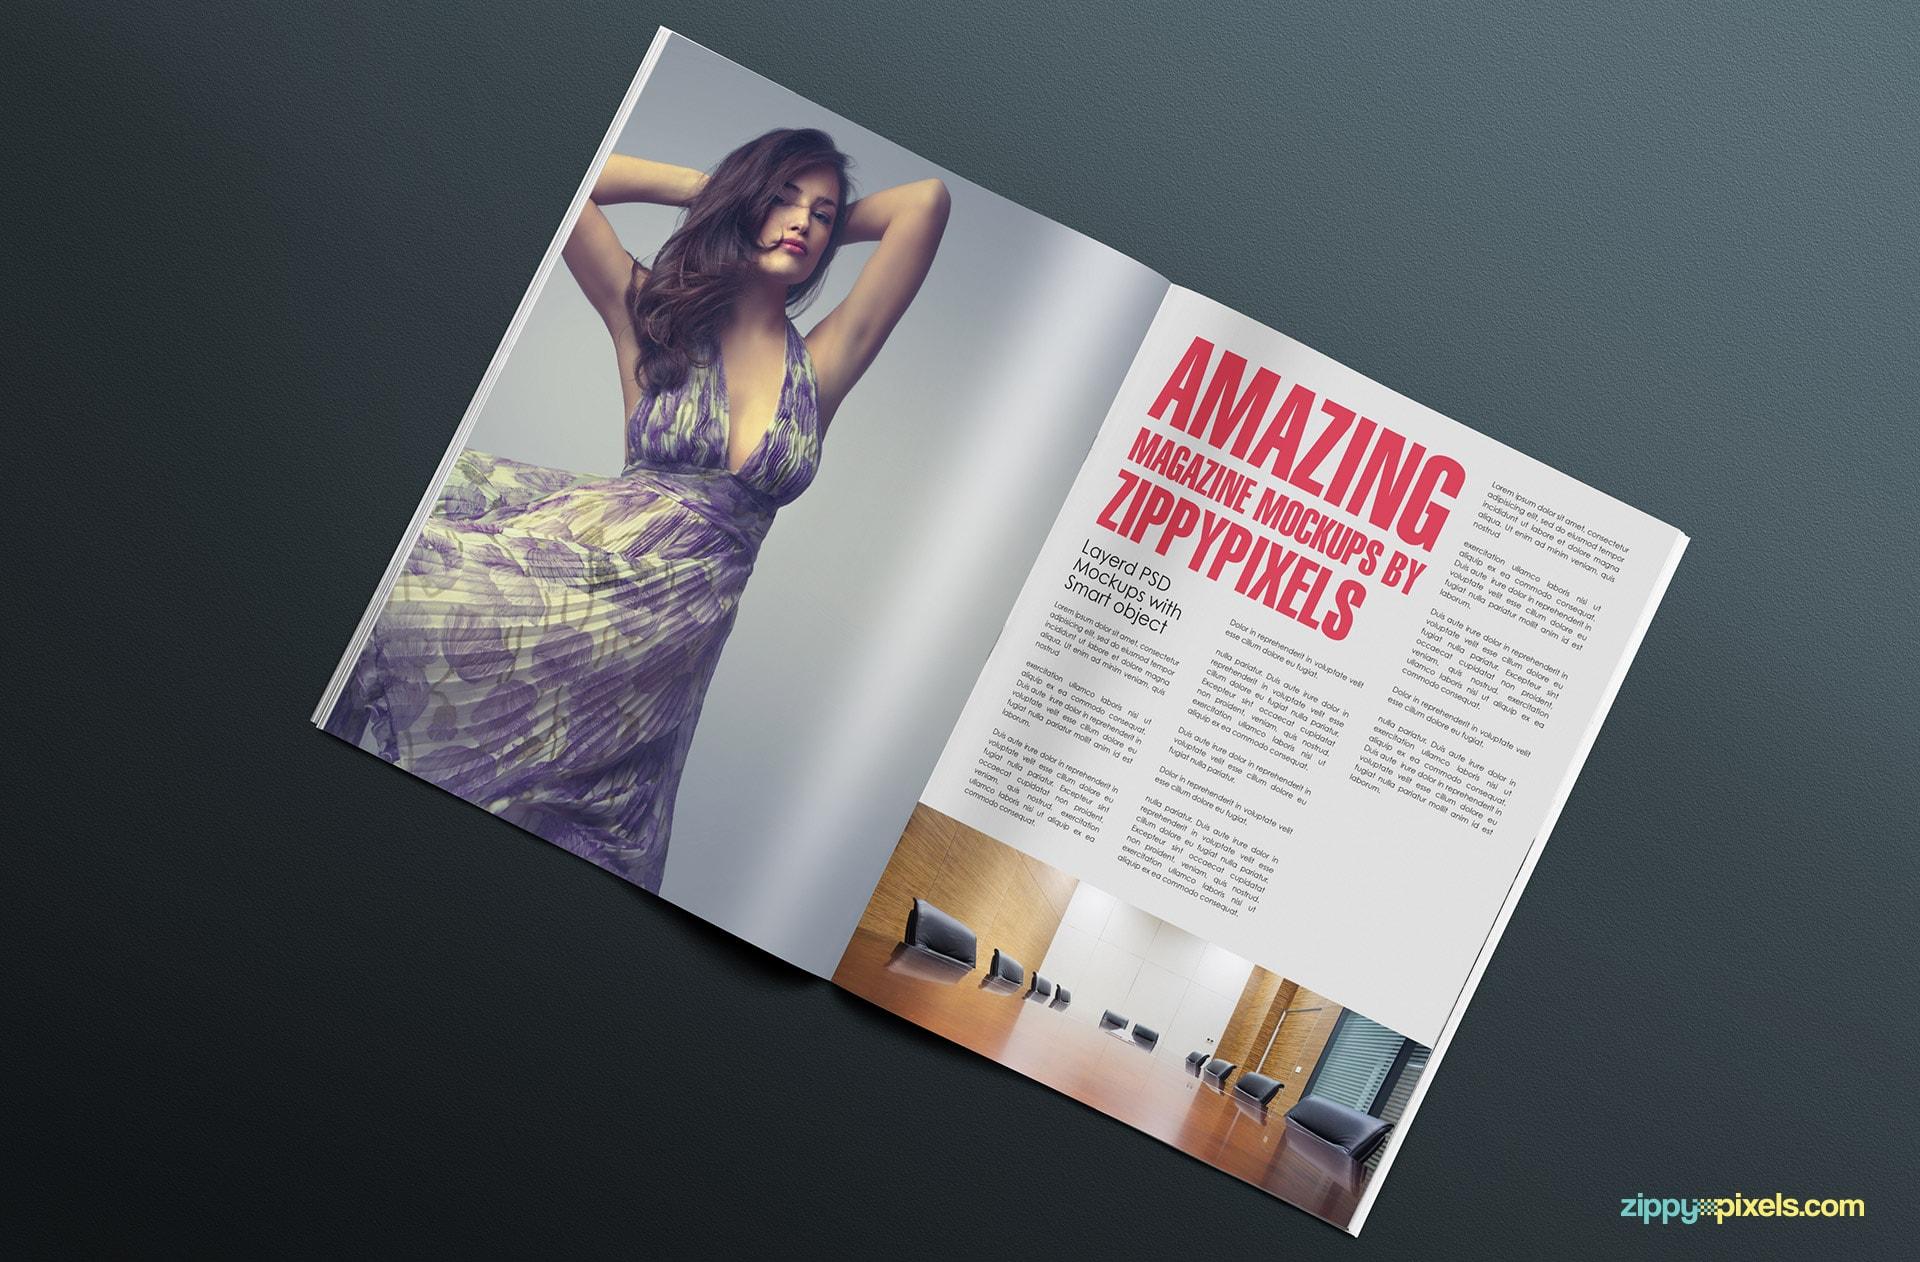 showcase your spread editorial designs realistically